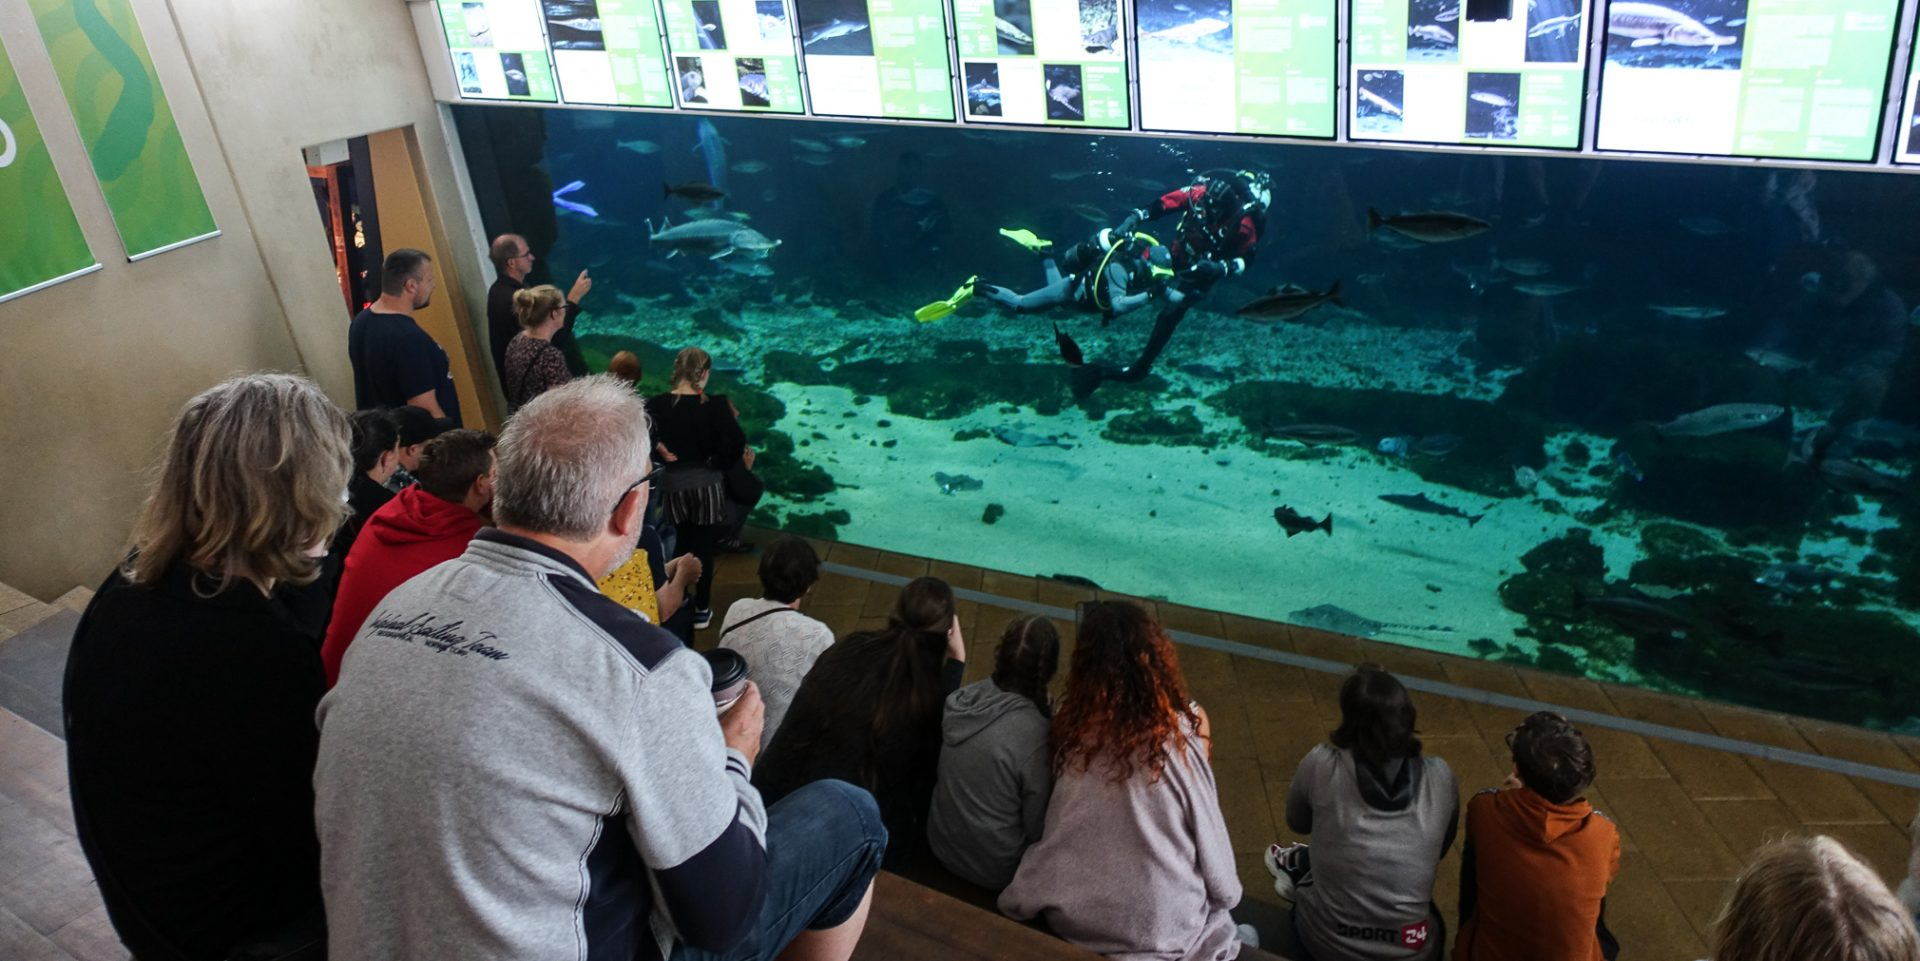 Reportage: HAJ-five til Kattegatcentret i Grenaa